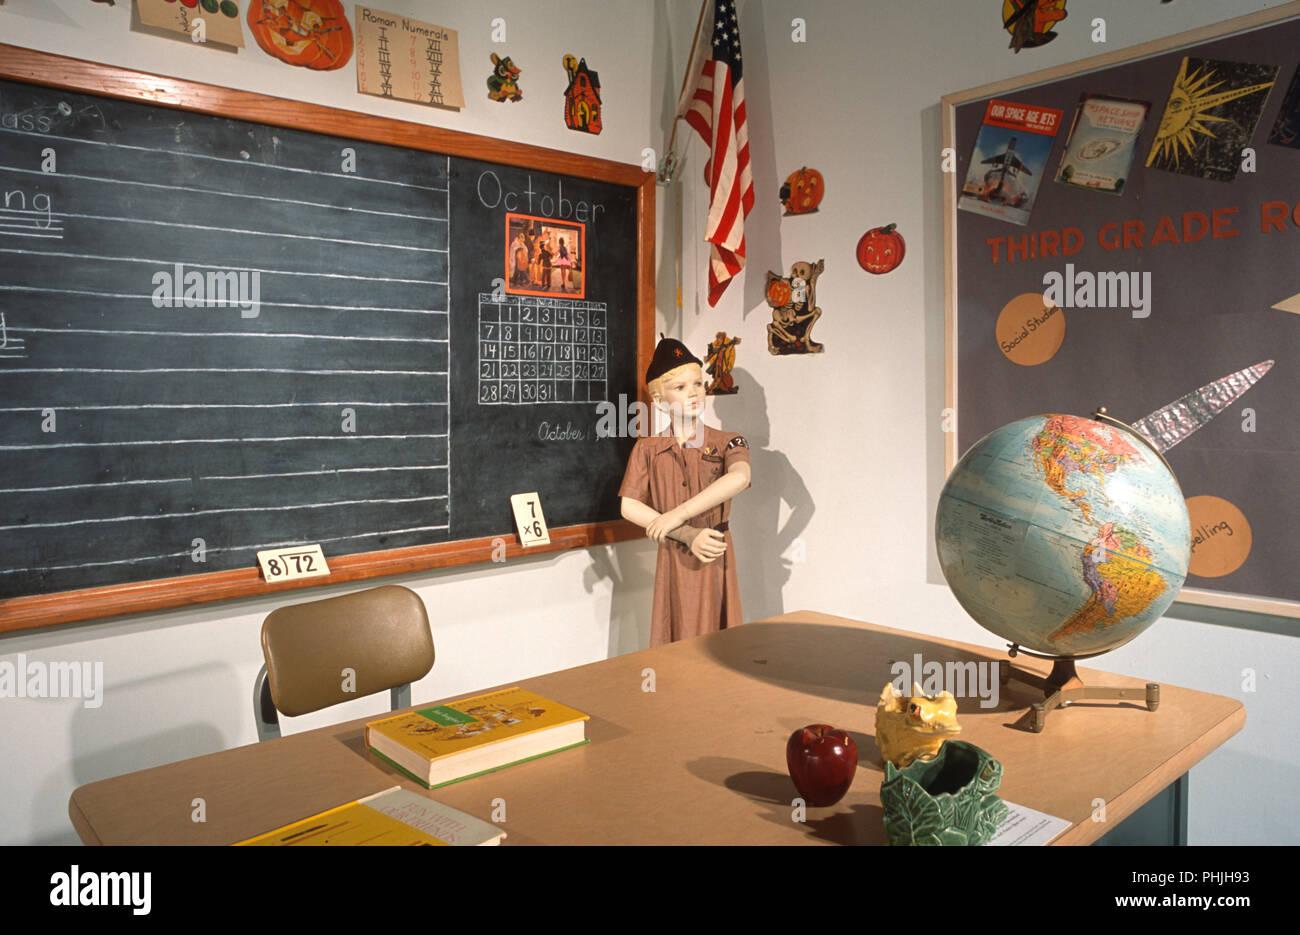 Replica of Grade School Classroom in a Museum, USA - Stock Image